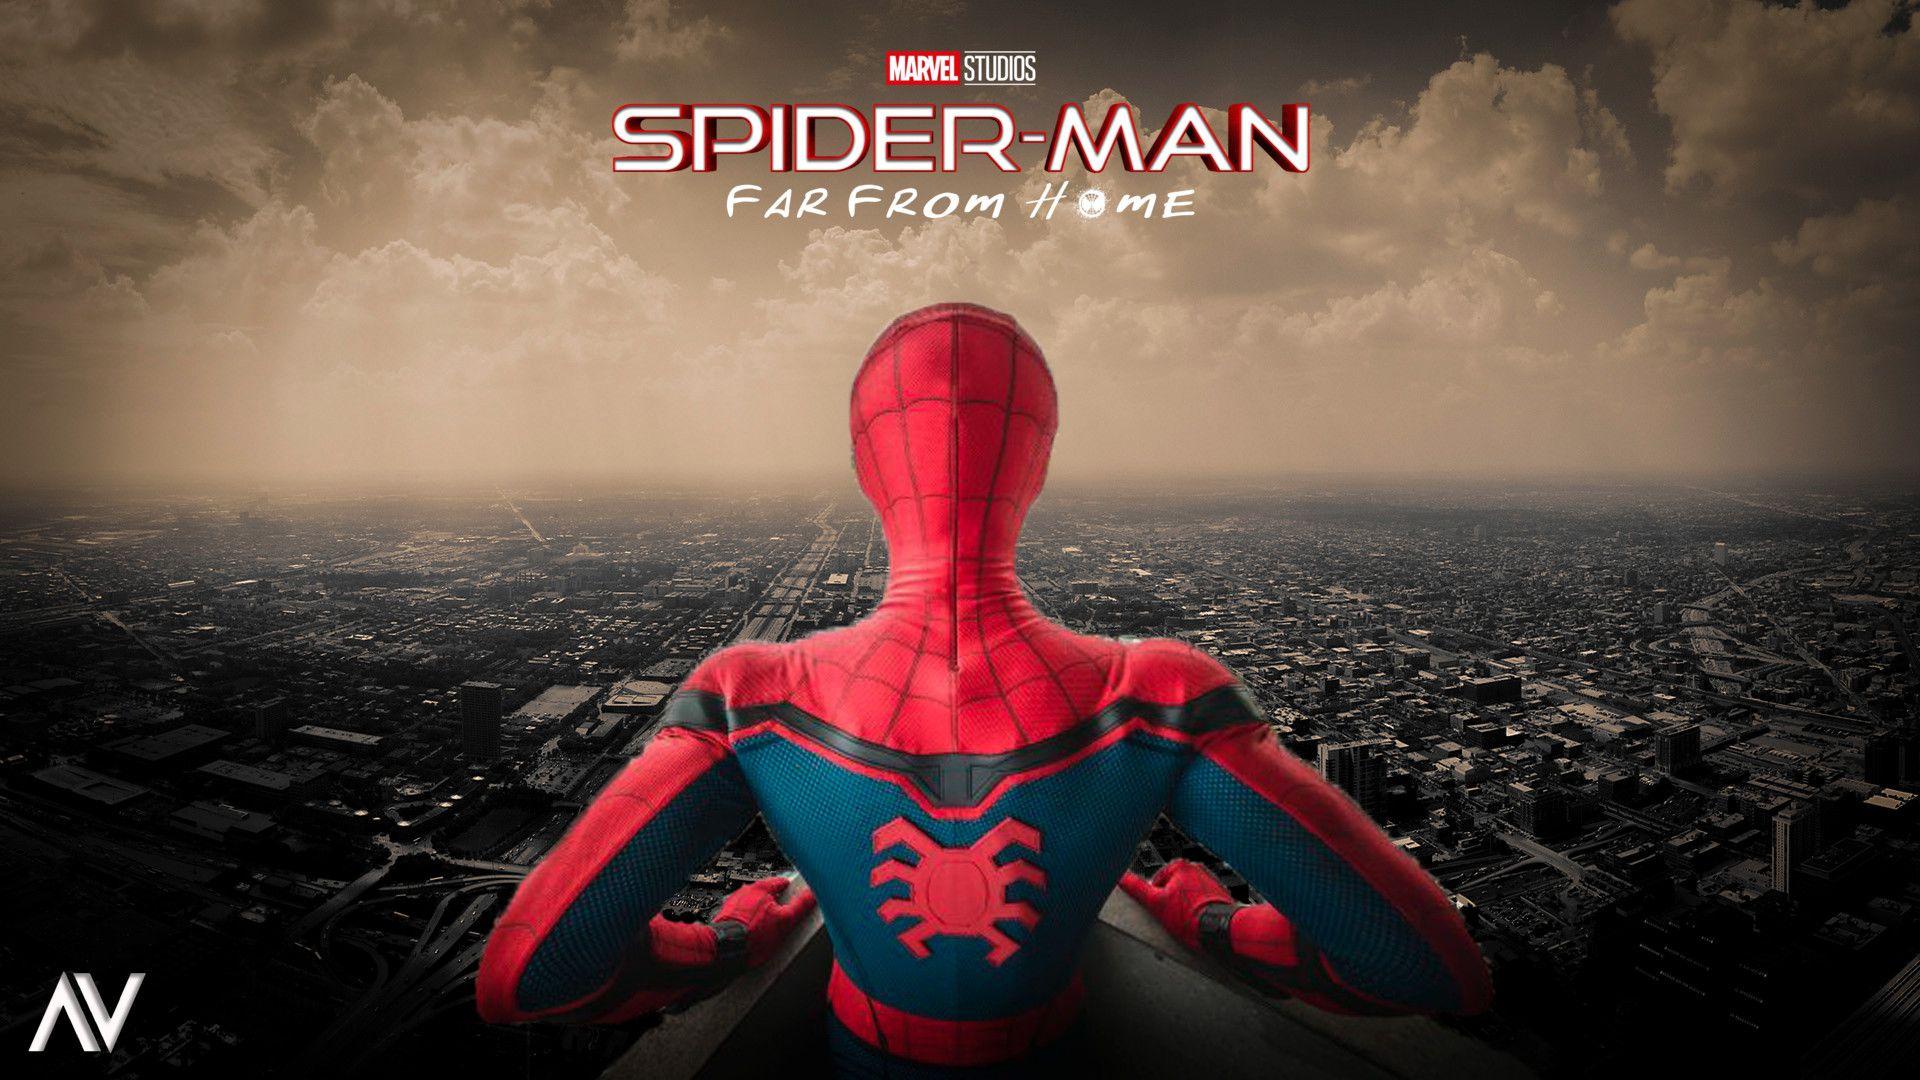 Park Art|My WordPress Blog_Google Drive Spider Man Far From Home Movie